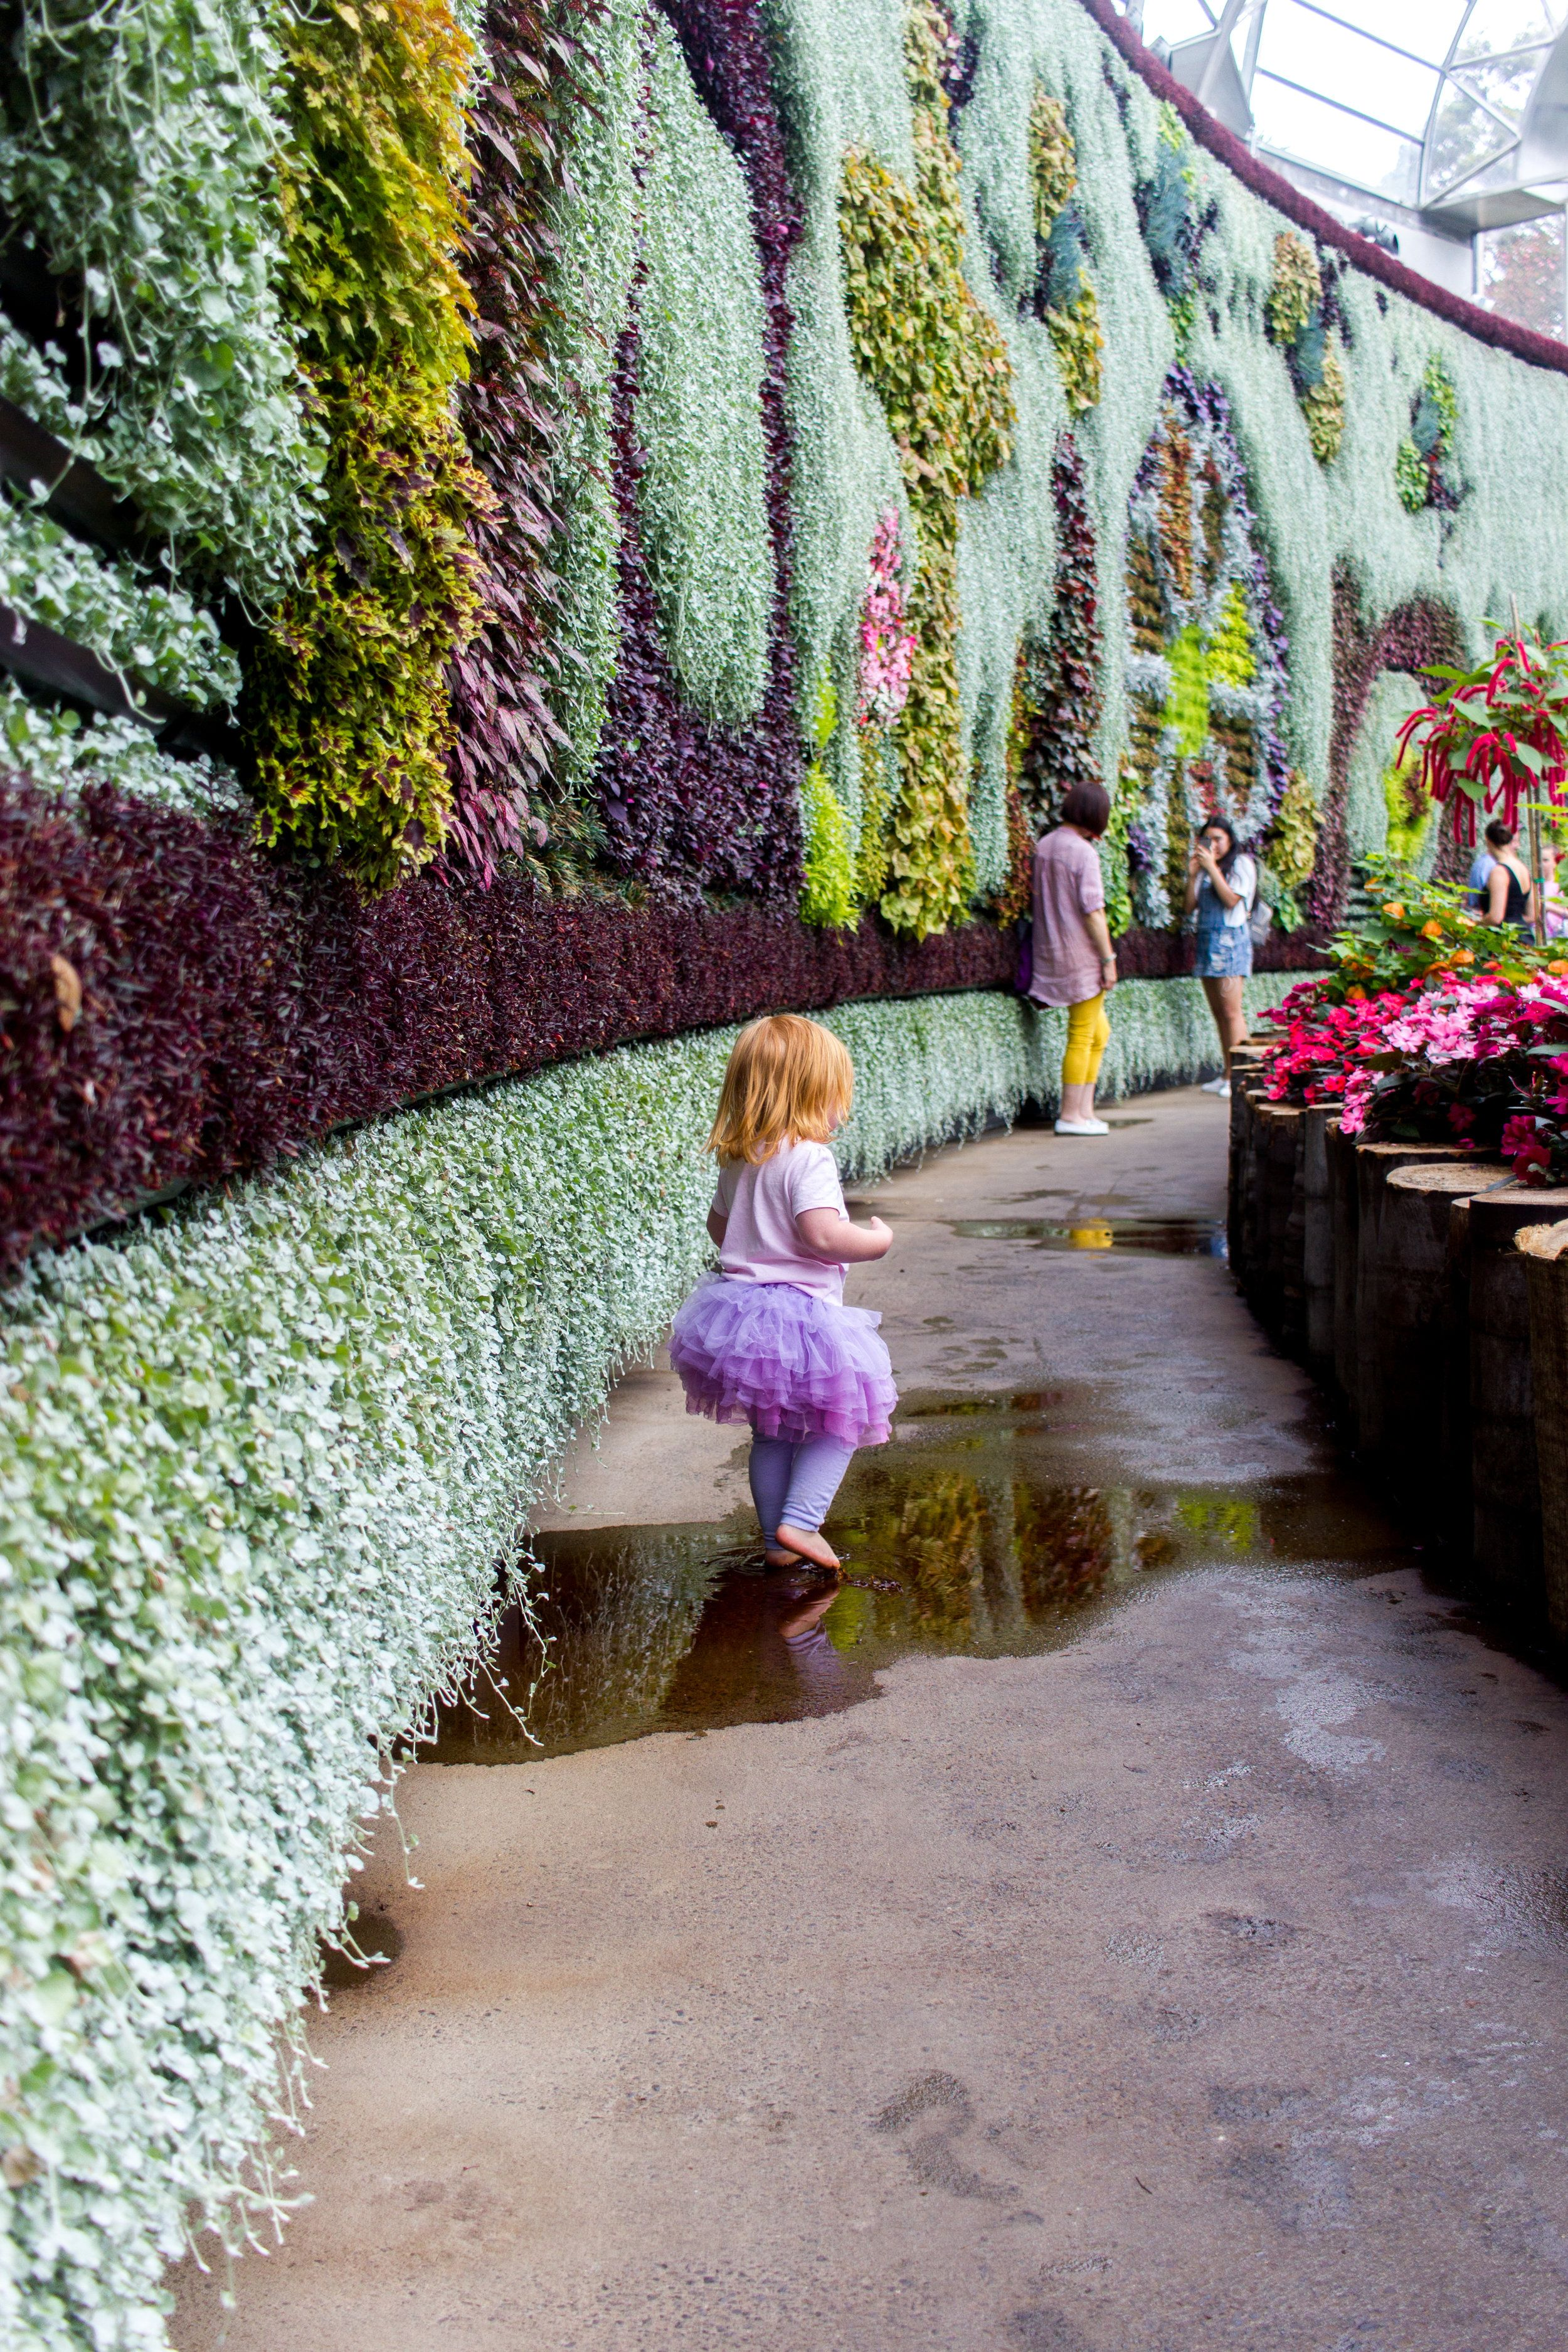 What To Do In Royal Botanic Gardens Sydney